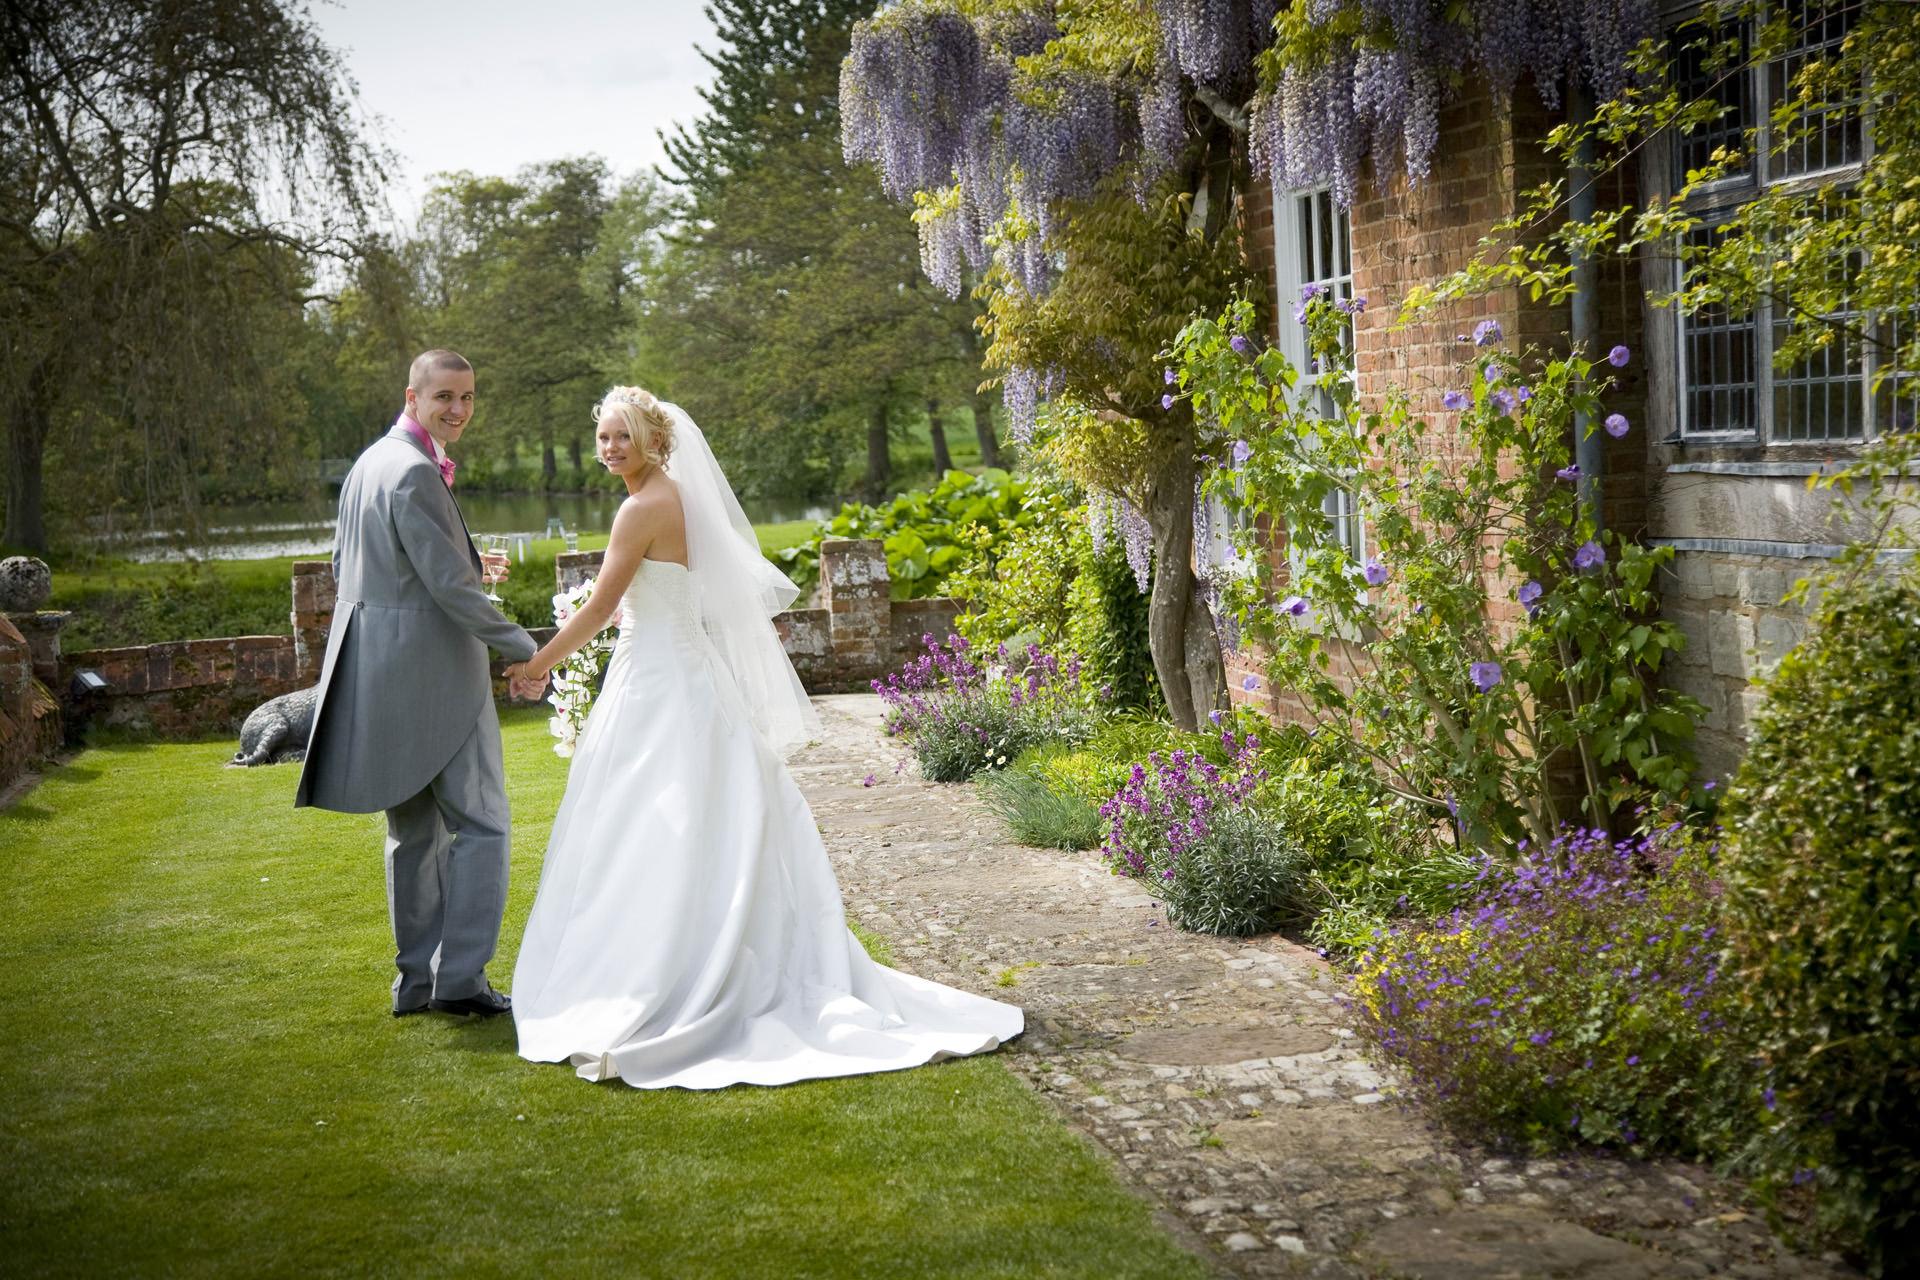 wisteria wild flowers and weddings a rundown of spring at birtsmorton court birtsmorton court. Black Bedroom Furniture Sets. Home Design Ideas